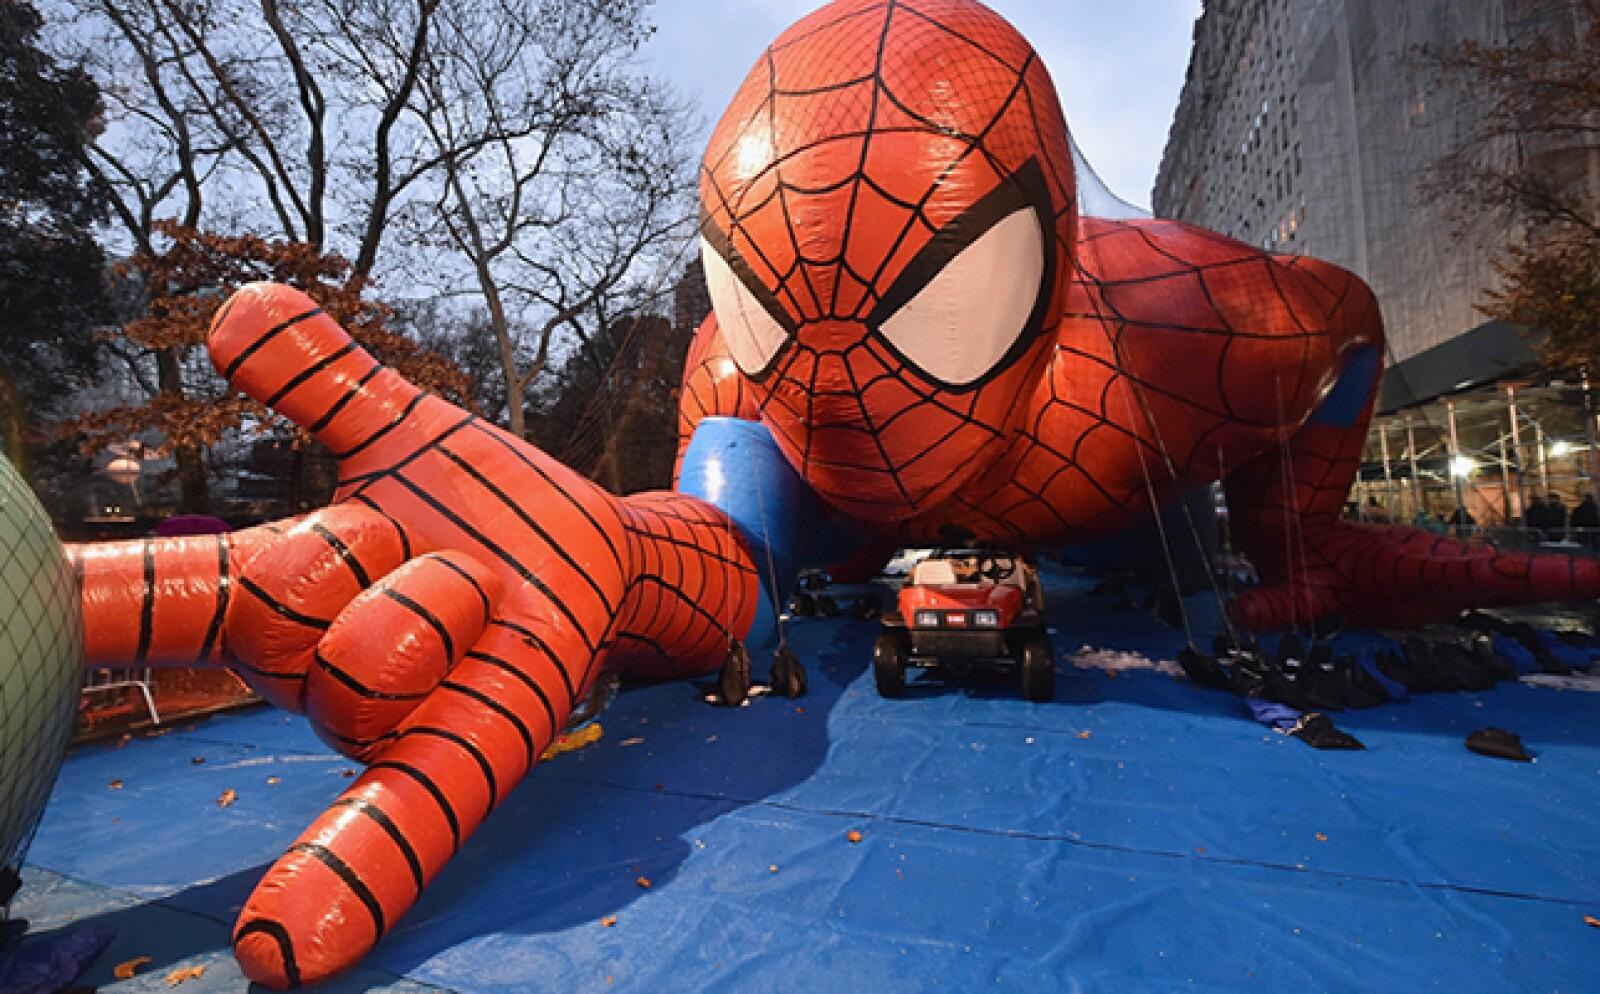 Cerca de 52 figuras inflables recorren las calles de Manhattan.